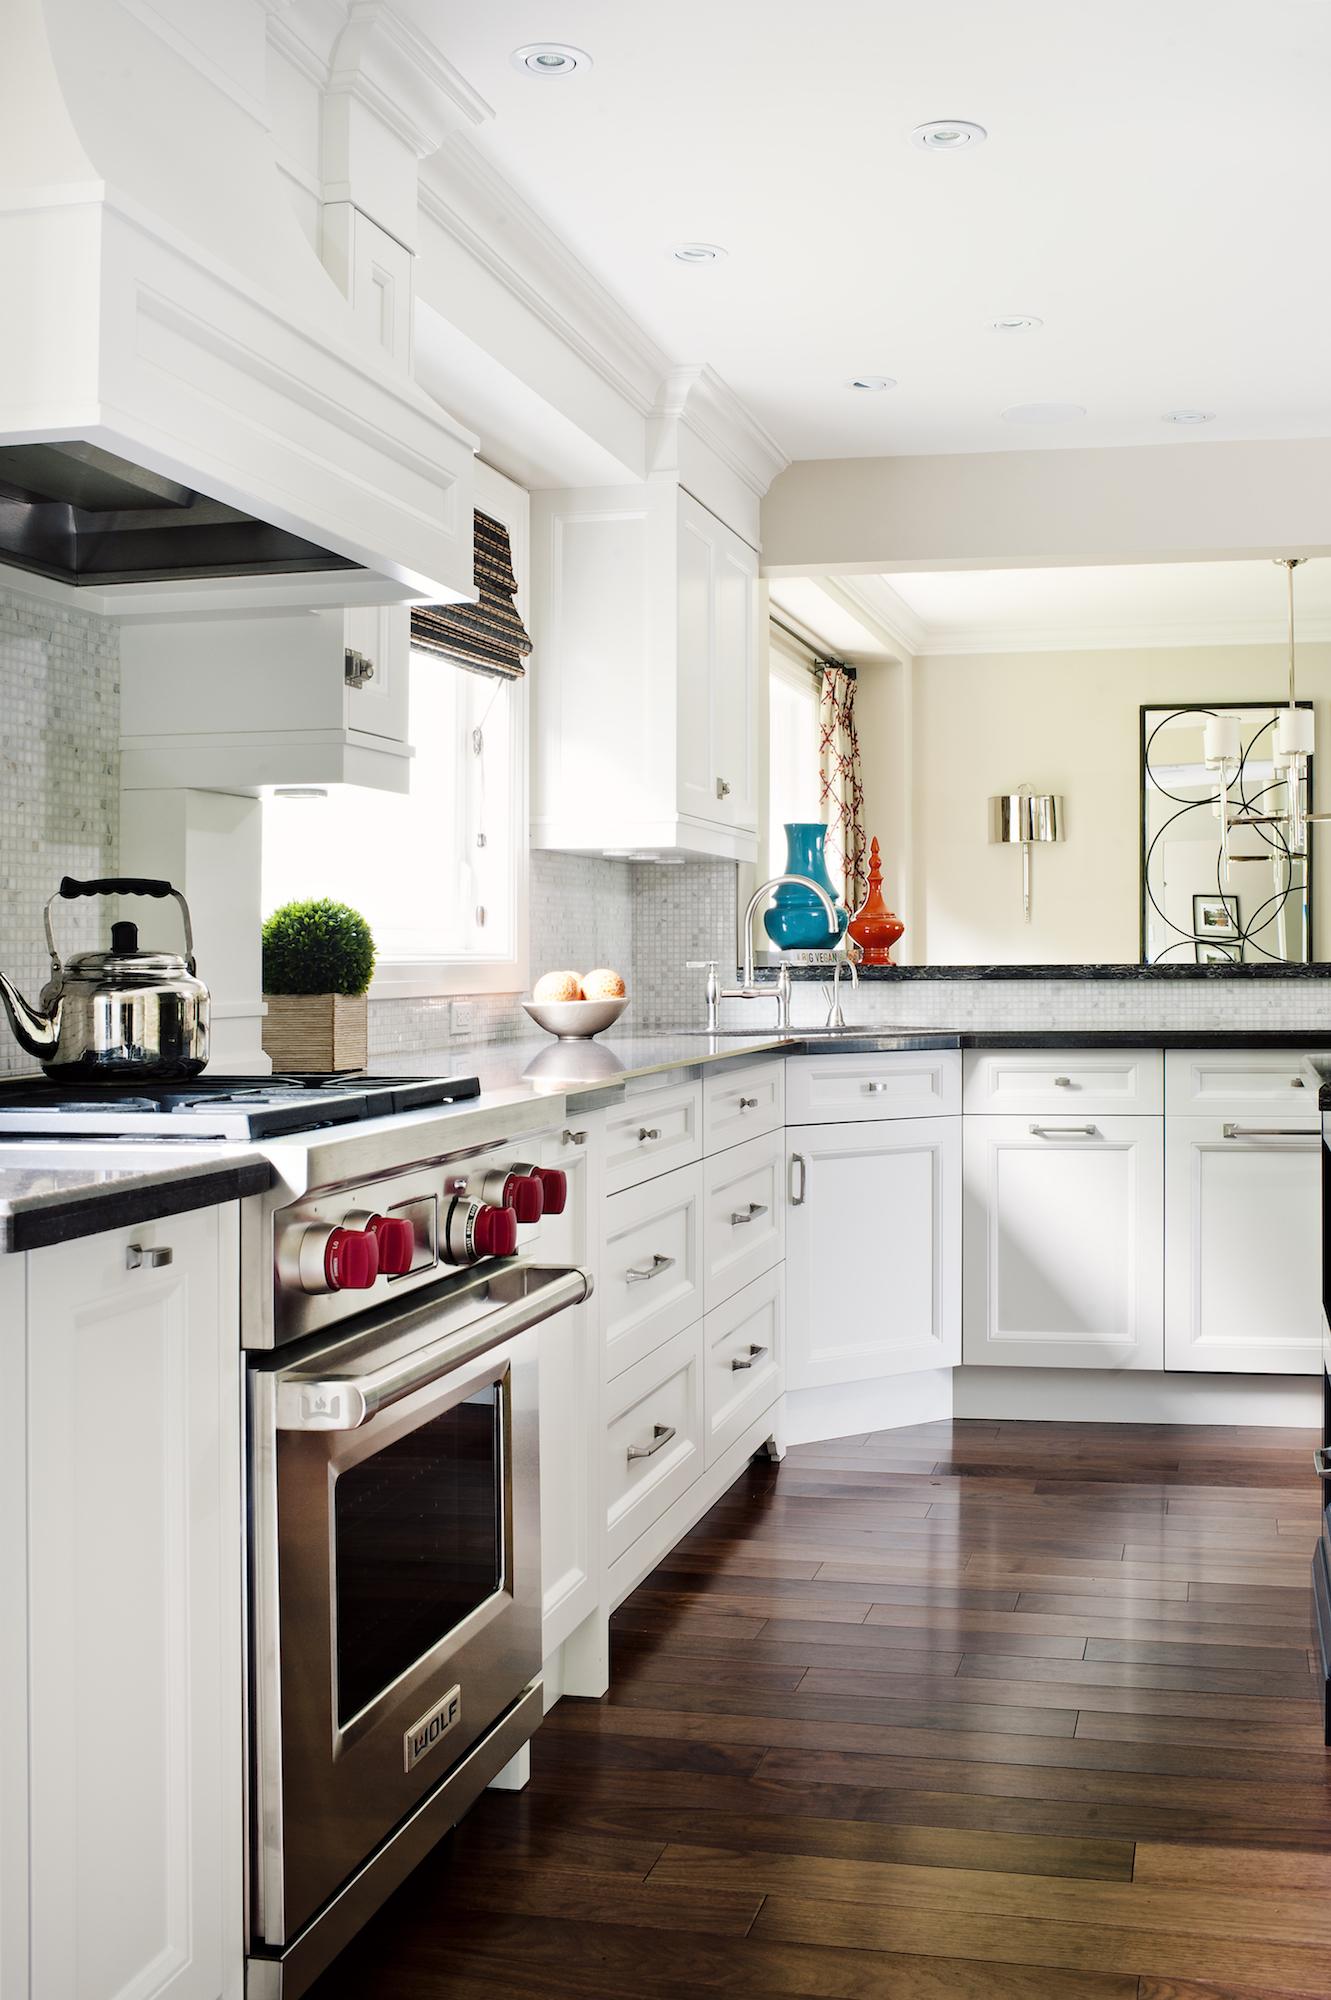 10 Pizzale Design Interior Decorating white millwork quartz counter .jpg